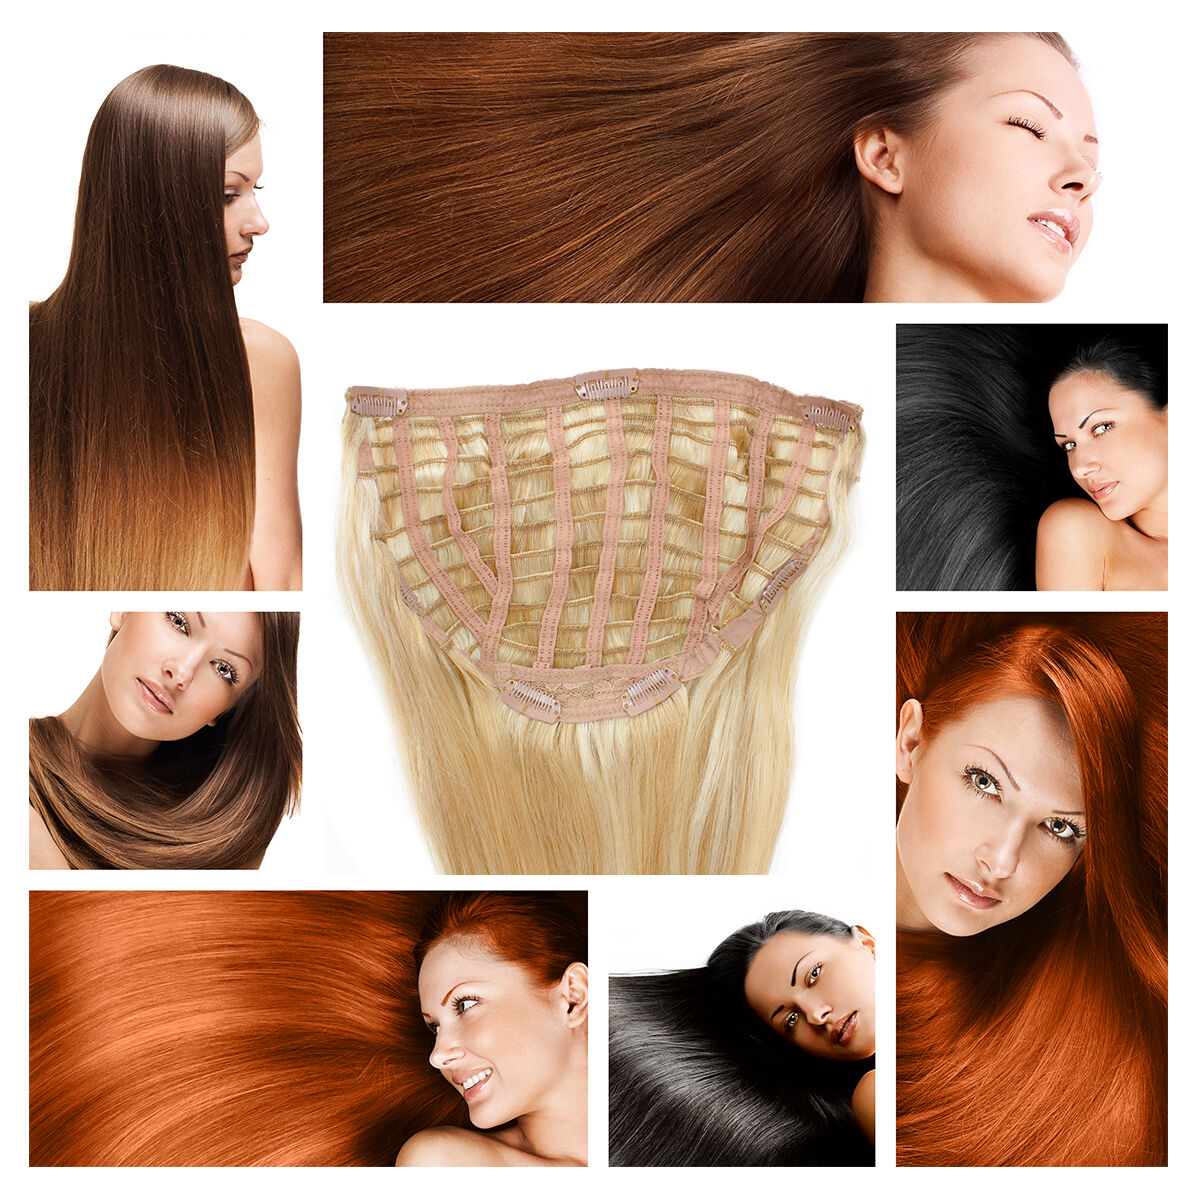 Haarteile Echthaar Zopf Test Vergleich Haarteile Echthaar Zopf